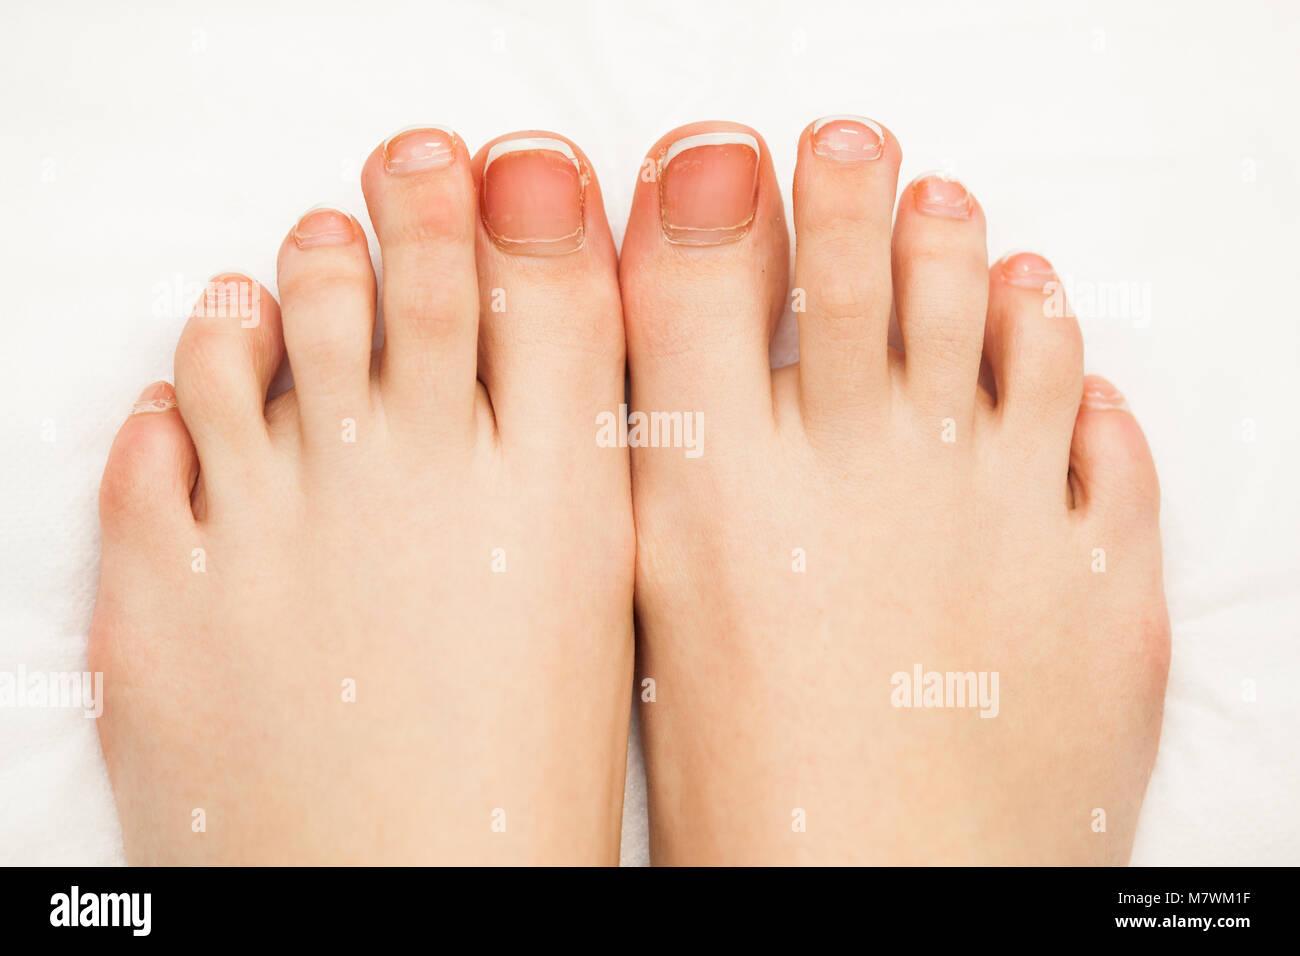 Long Toe Nails Stock Photos & Long Toe Nails Stock Images - Alamy